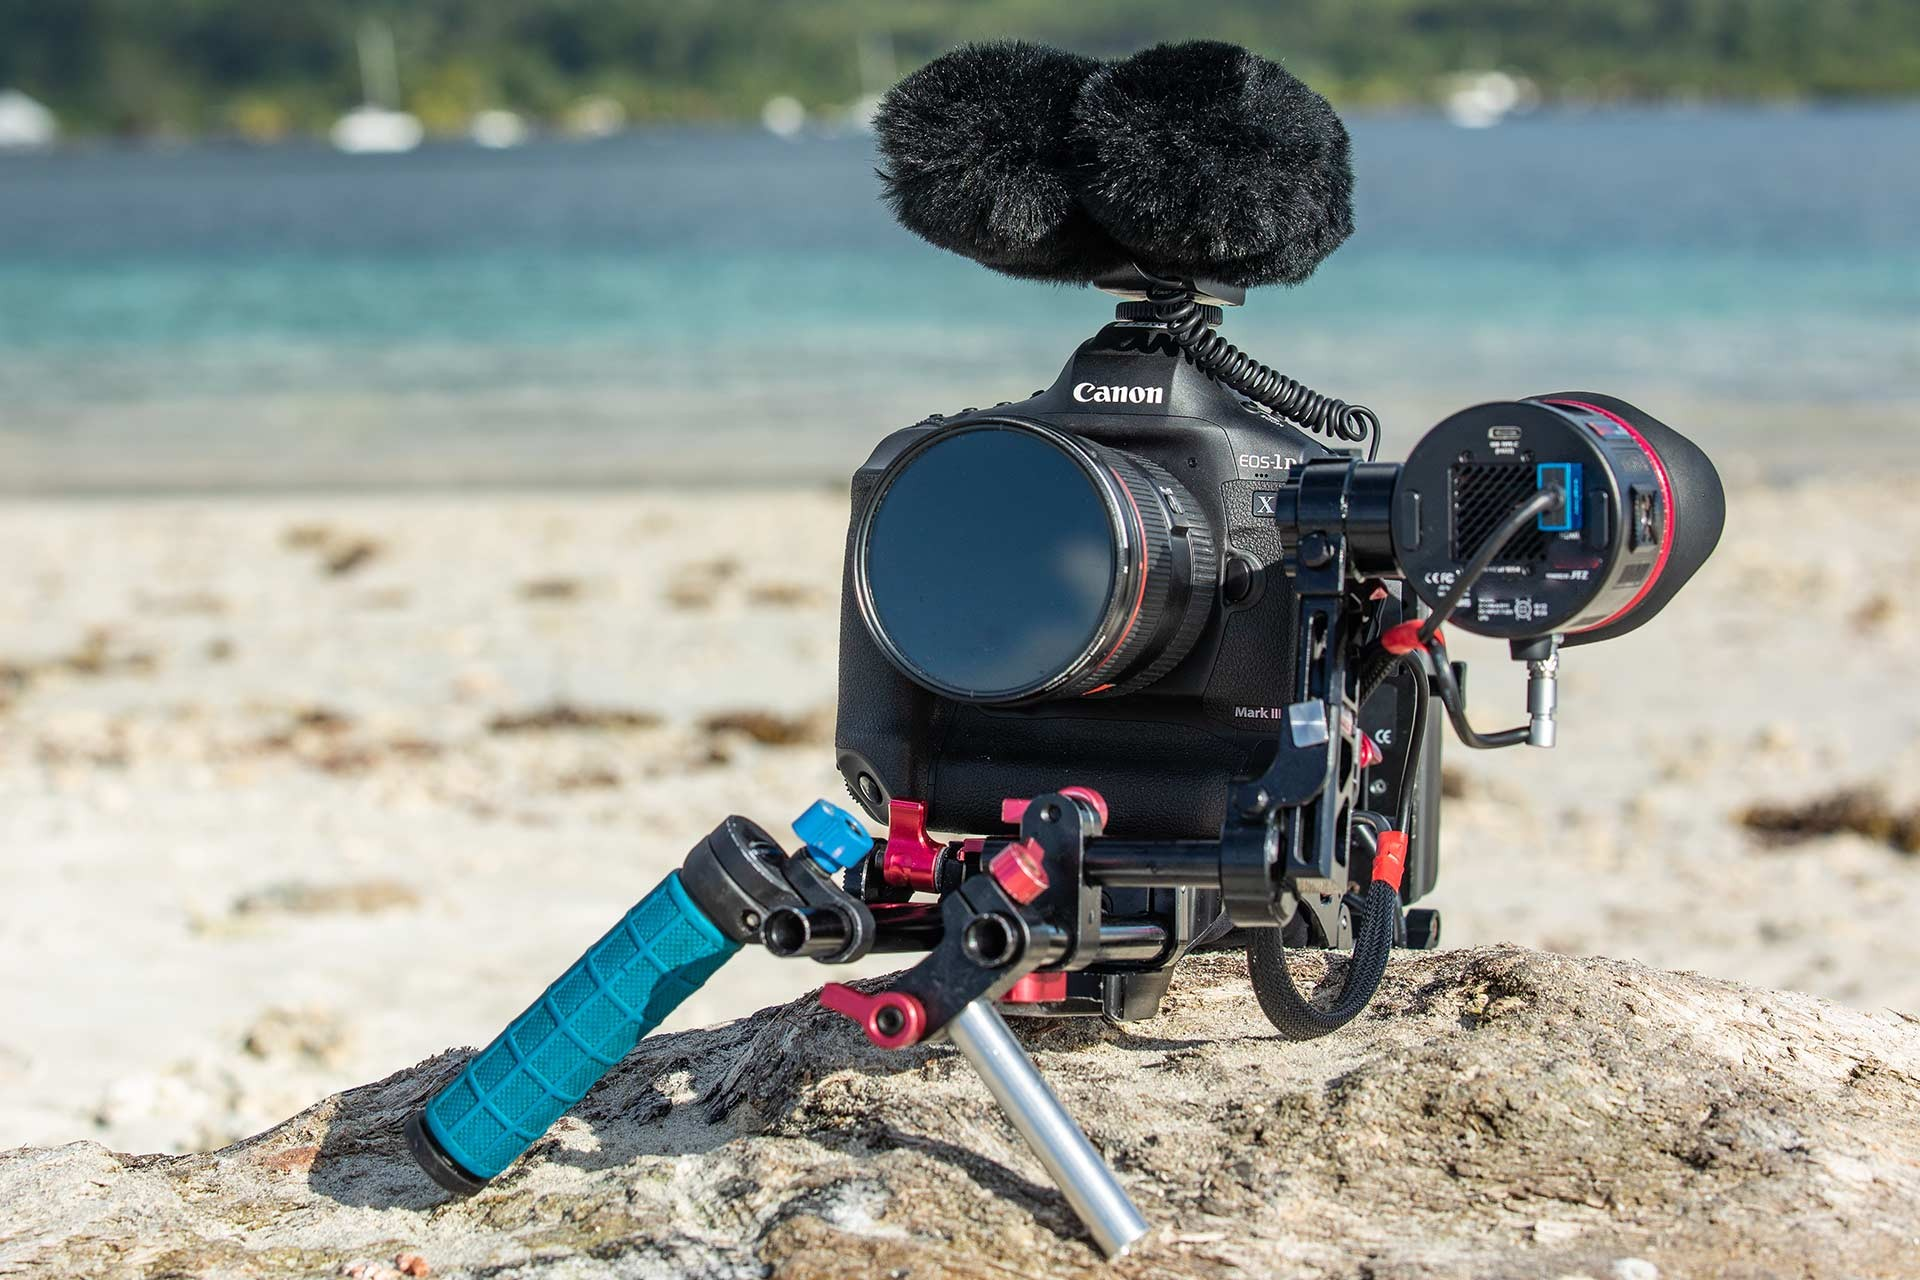 EOS-1D X Mark III: Filmen im Vollformat - Canon Academy Webinare